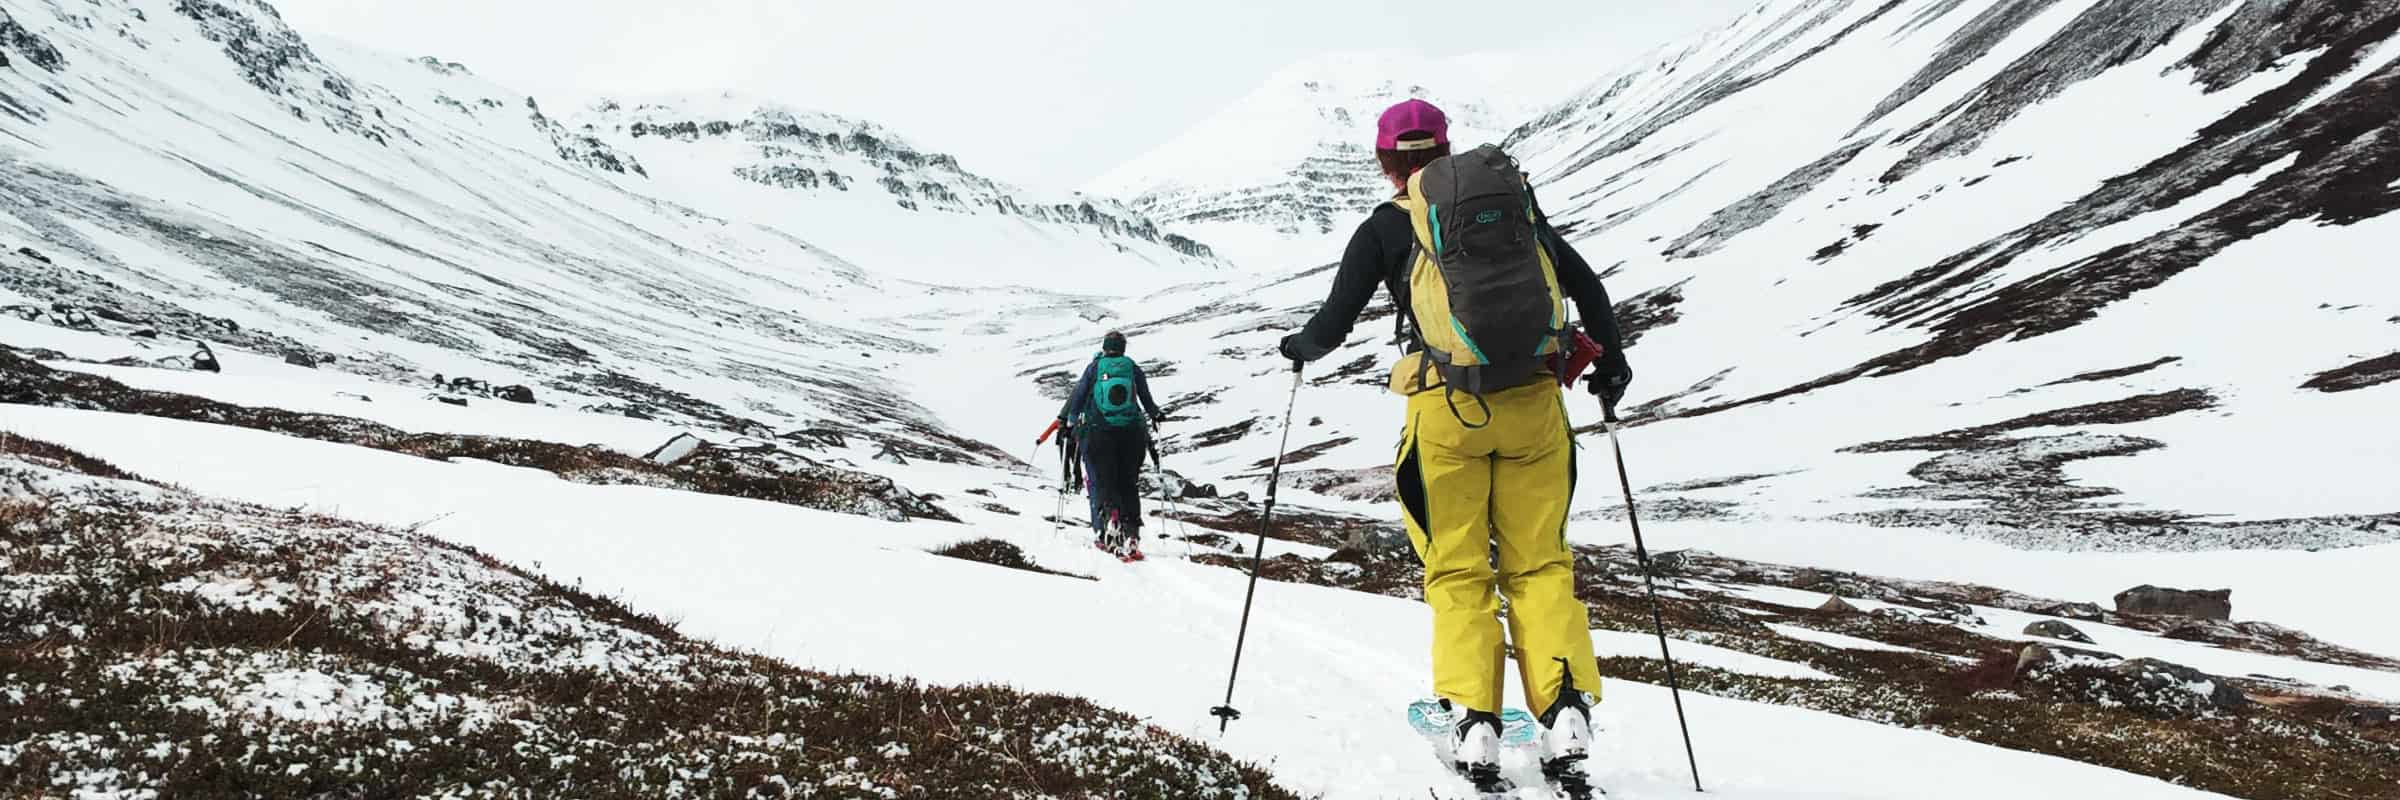 Smartwool, Islande et ski de haute-route